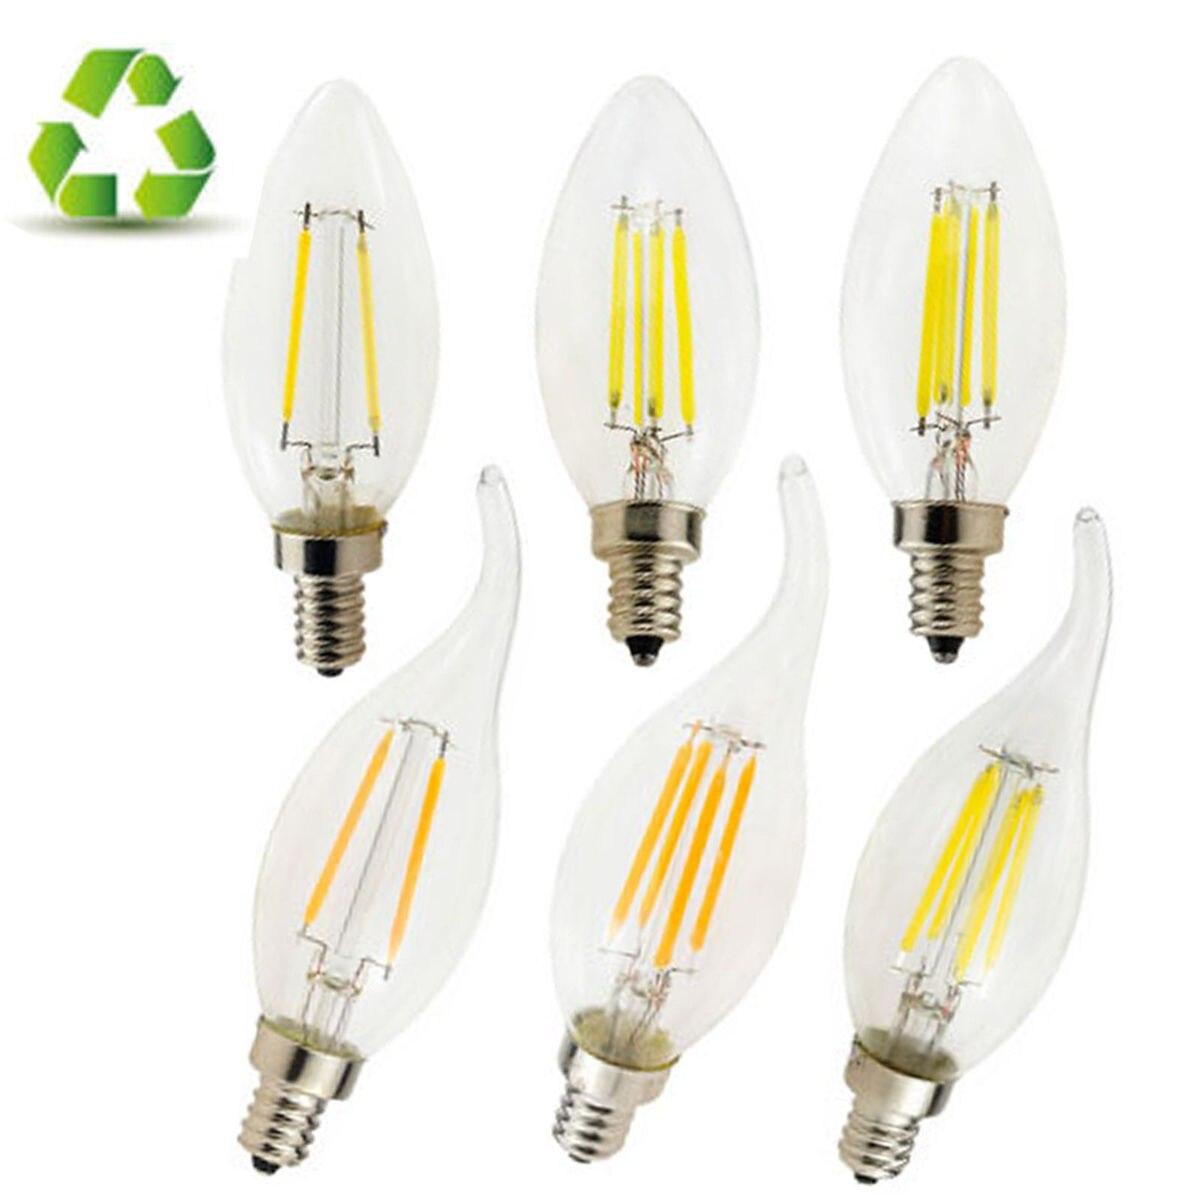 Lampada E12 Led Vela: 10pcs/lot E14 E12 Base 110V 220V Candle & Flame LED Bulb